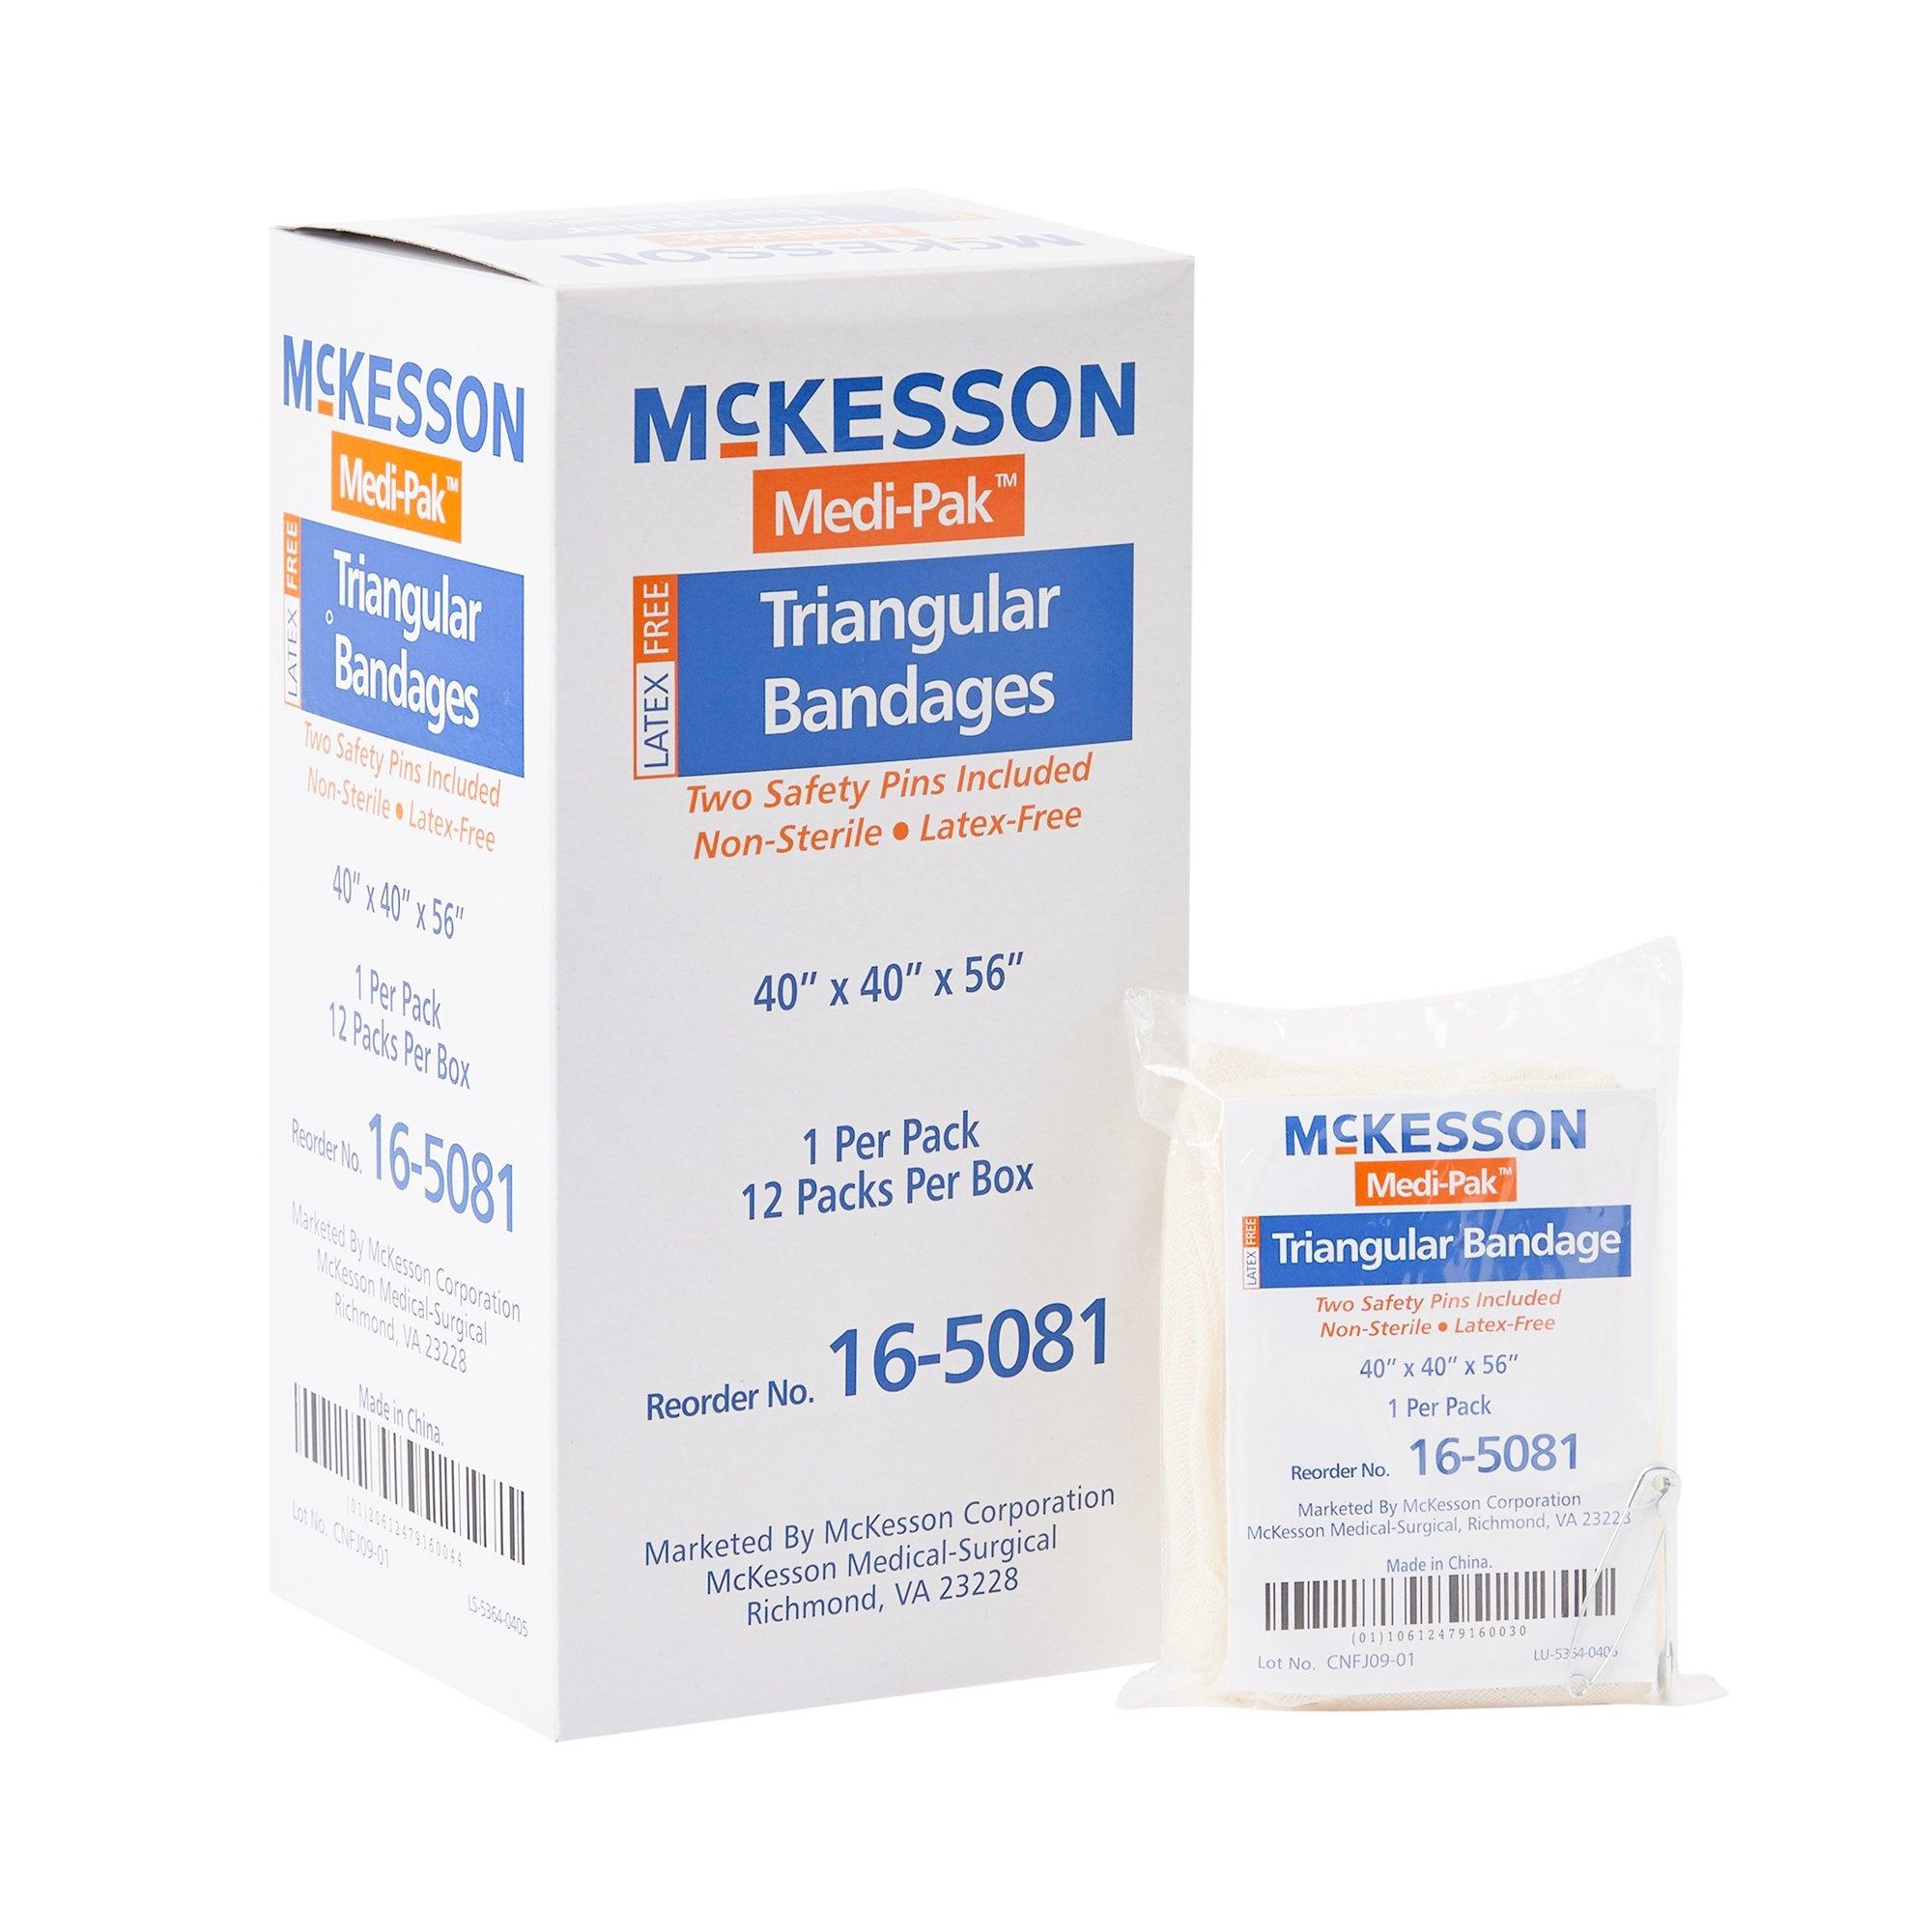 McKesson Medi-Pak Triangular Bandages/Sling, 16-5081, Box of 12